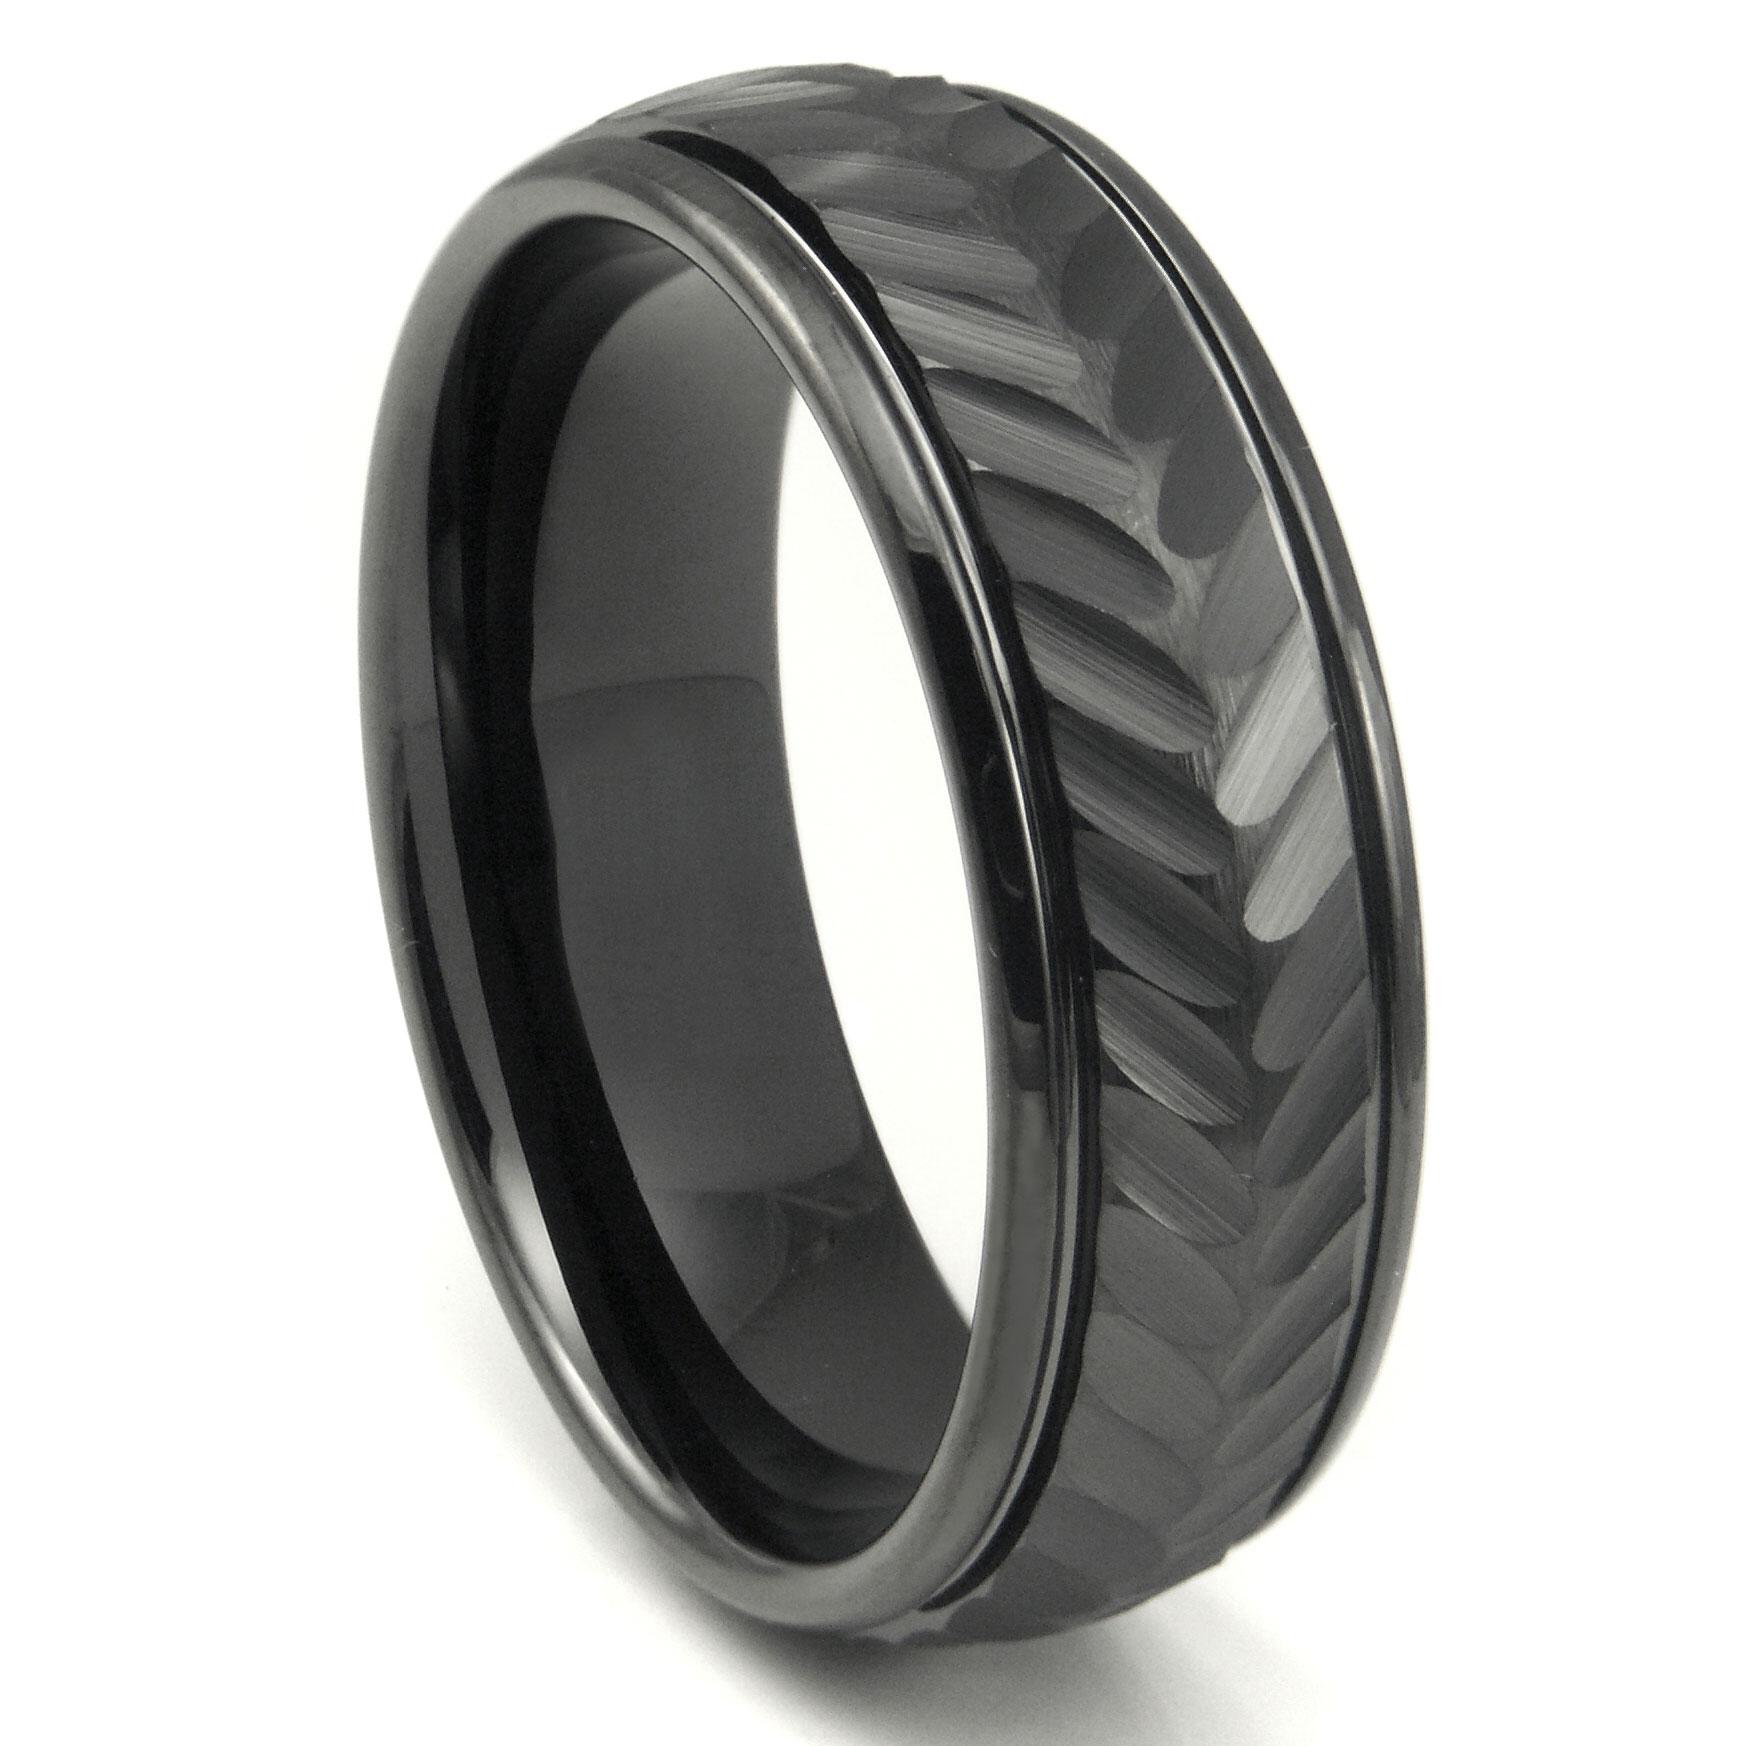 Black Tungsten Carbide 8MM Chevron Newport Wedding Band Ring